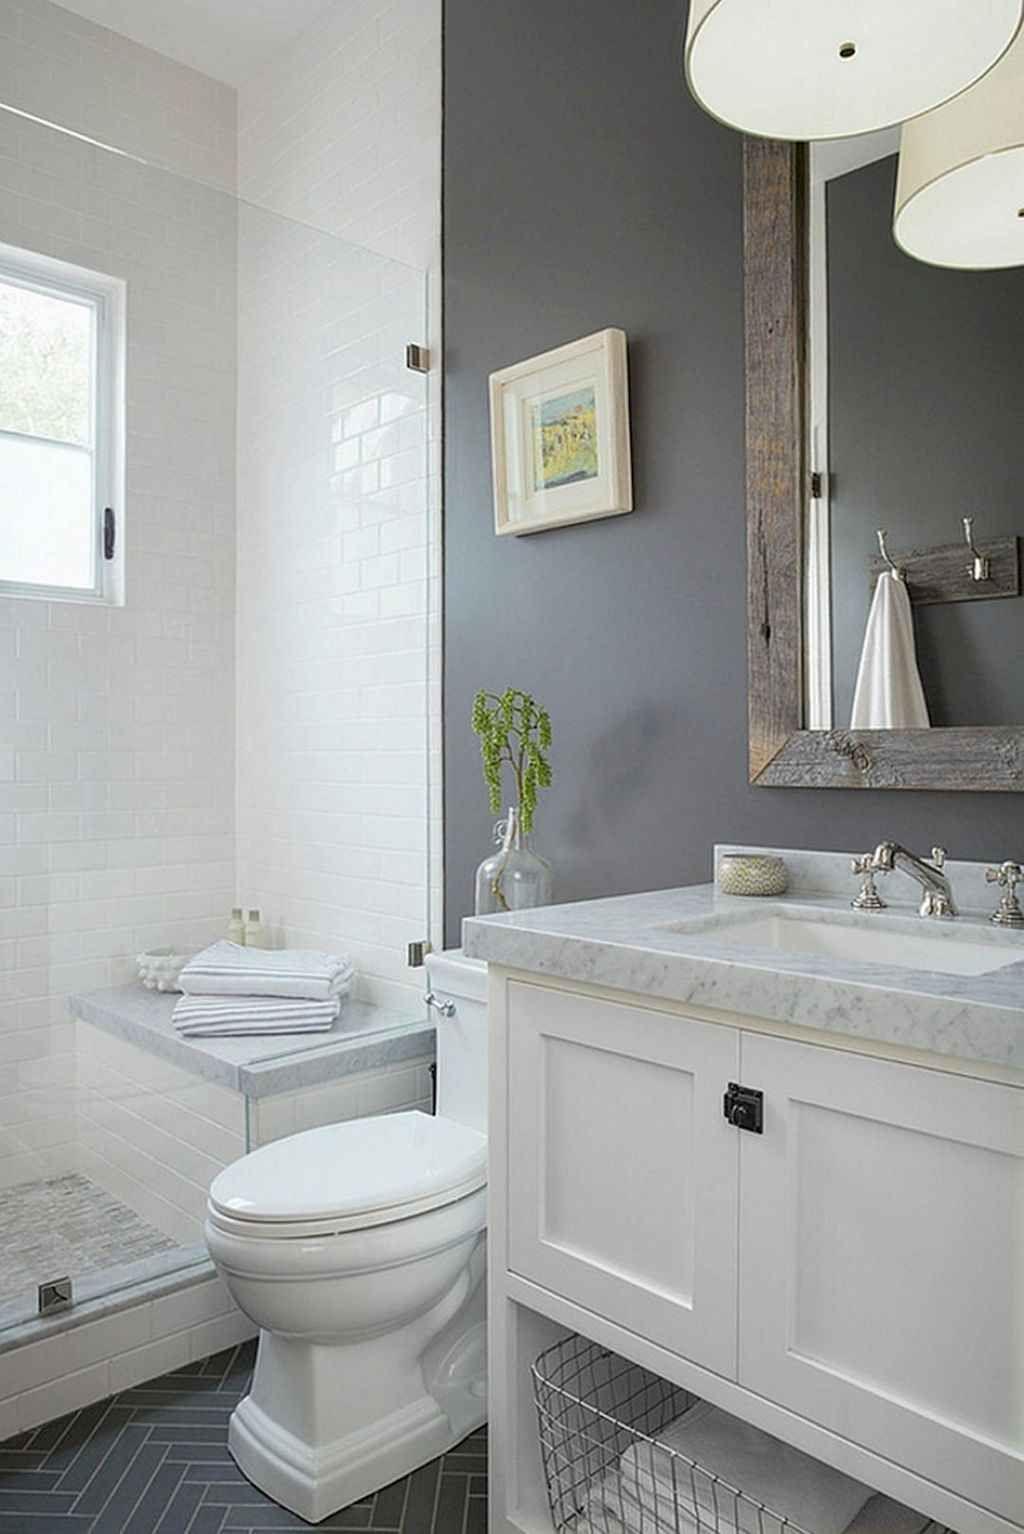 75 Tiny Apartment Bathroom Decoration Ideas Small Full Bathroom